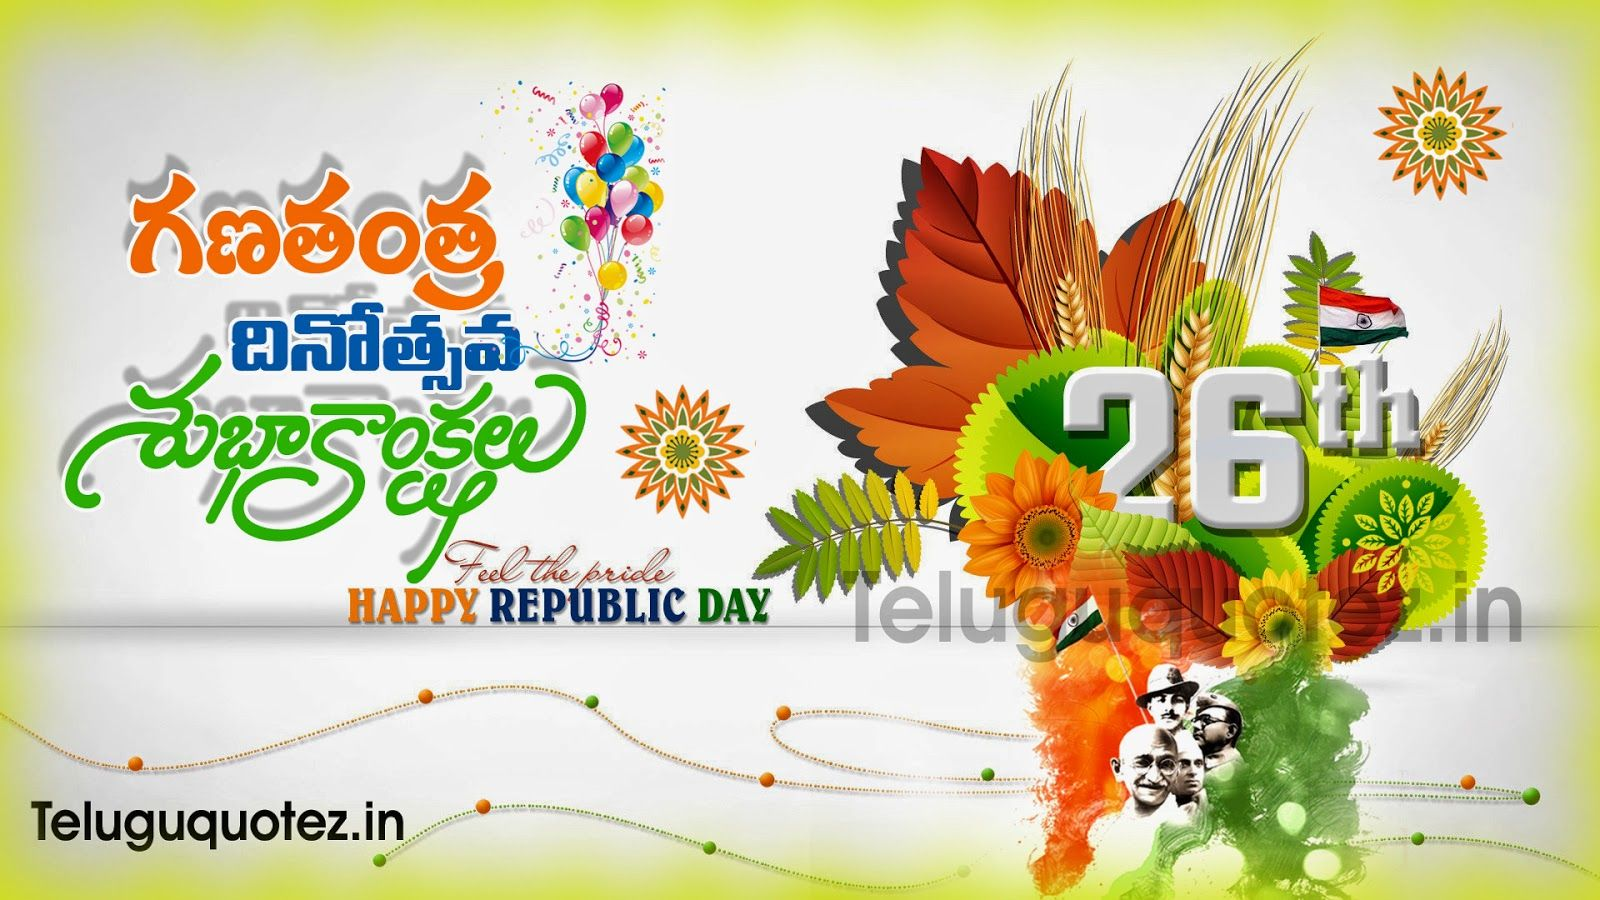 Naveengfx Com Republicday Telugu Quotes Republic Day Happy Republic Day Wallpaper Quotes On Republic Day